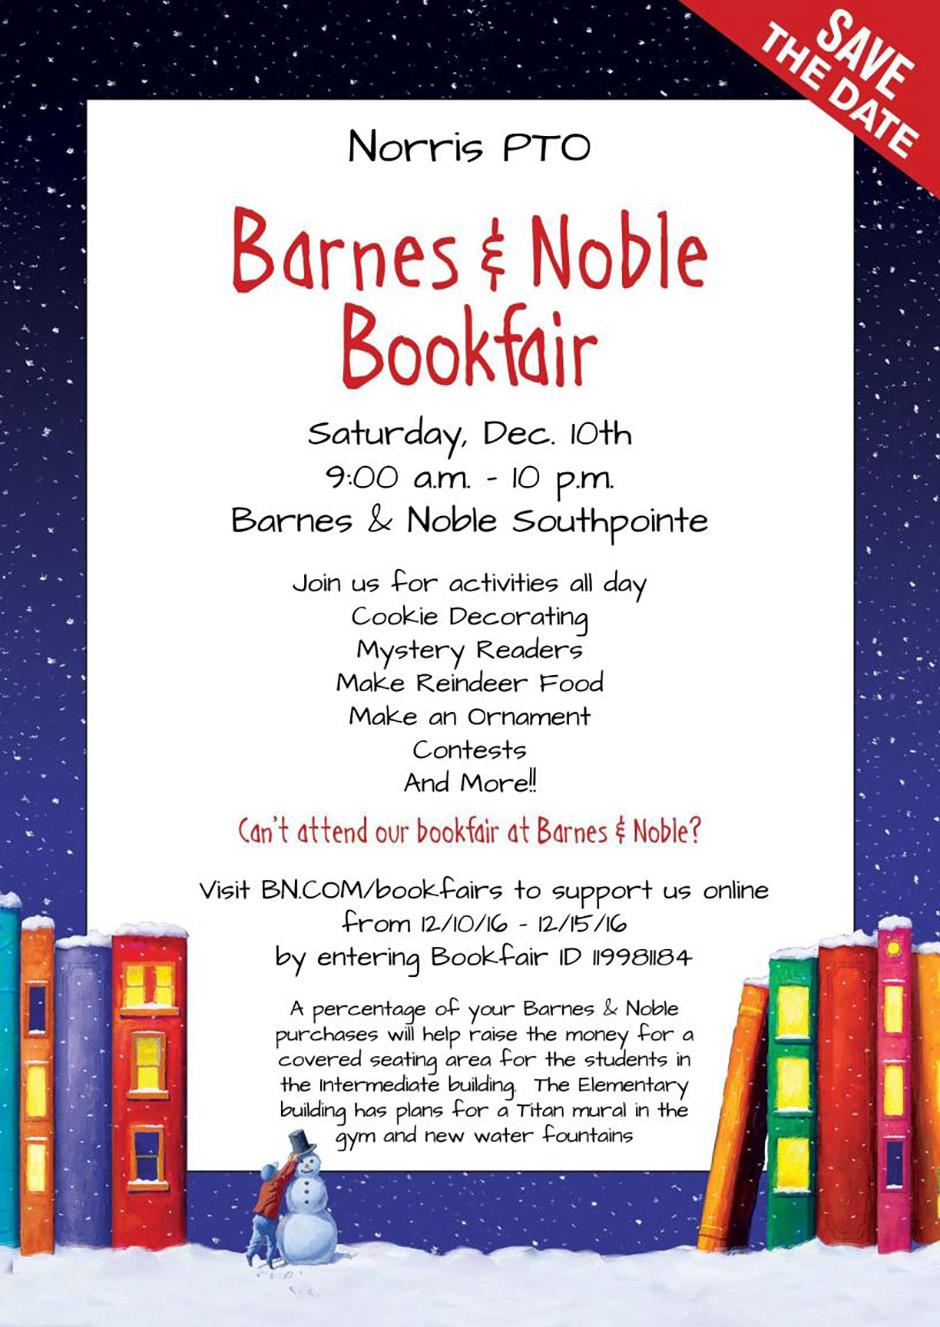 Barnes and Noble Bookfair benefits Norris PTO | Norris School District